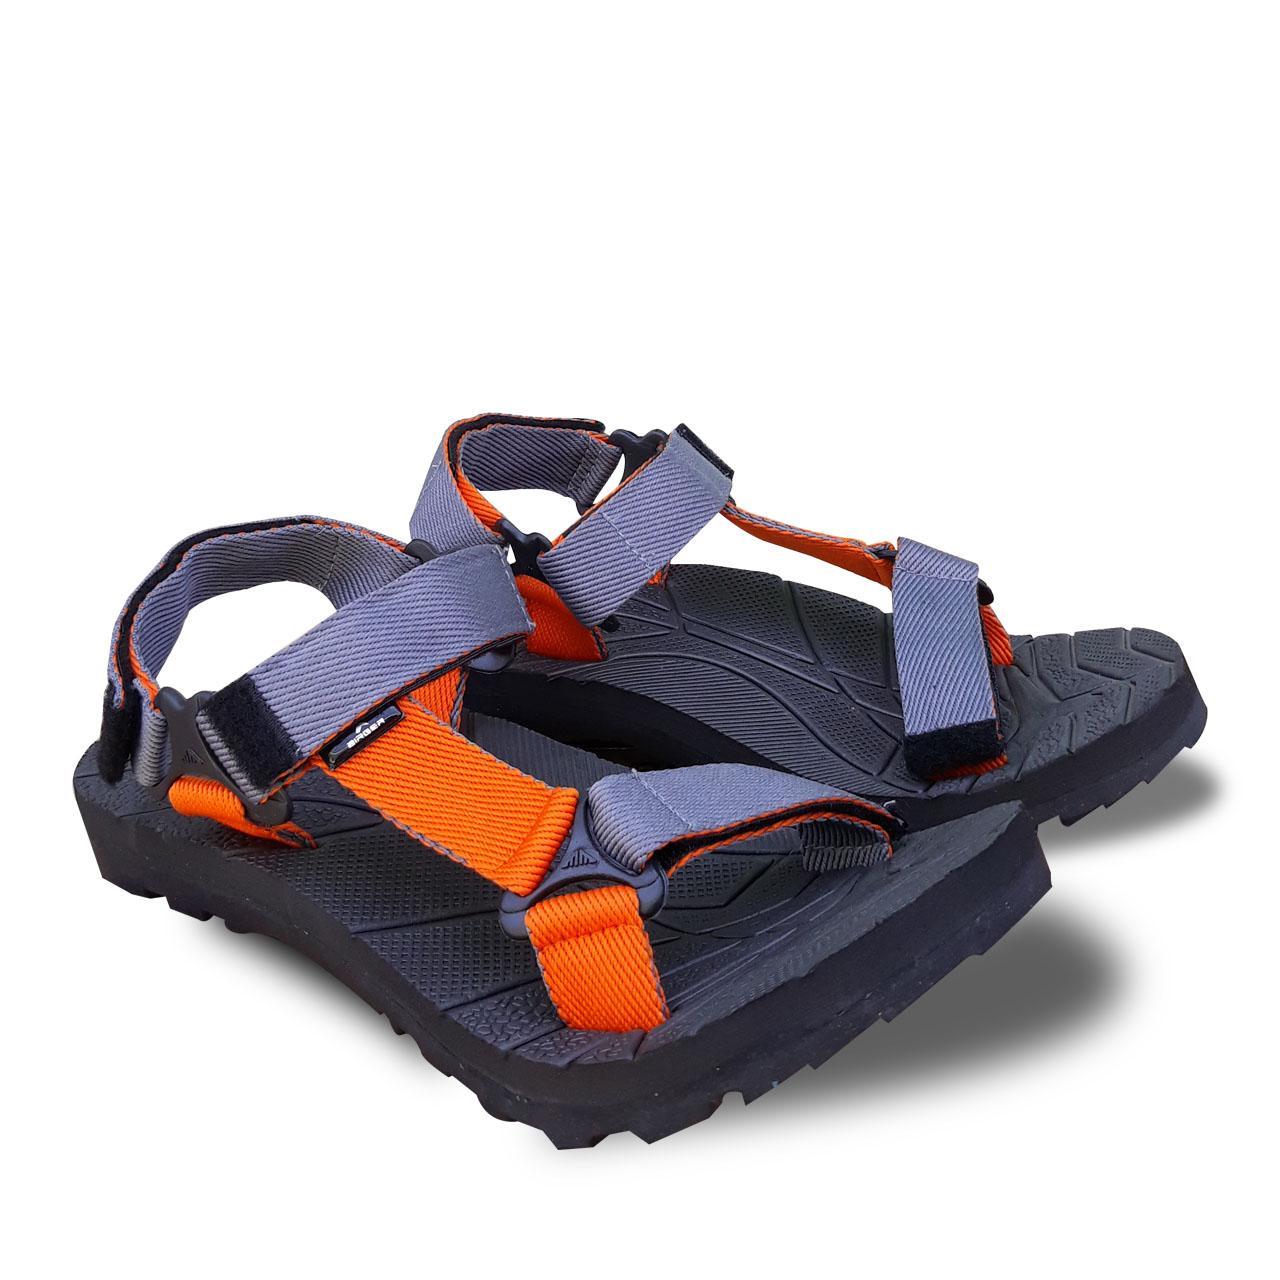 Amelia Olshop - Sandal Gunung AIGER 38-42 / Sandal Gunung Pria / Sandal Gunung Cowok / Sandal Gunung